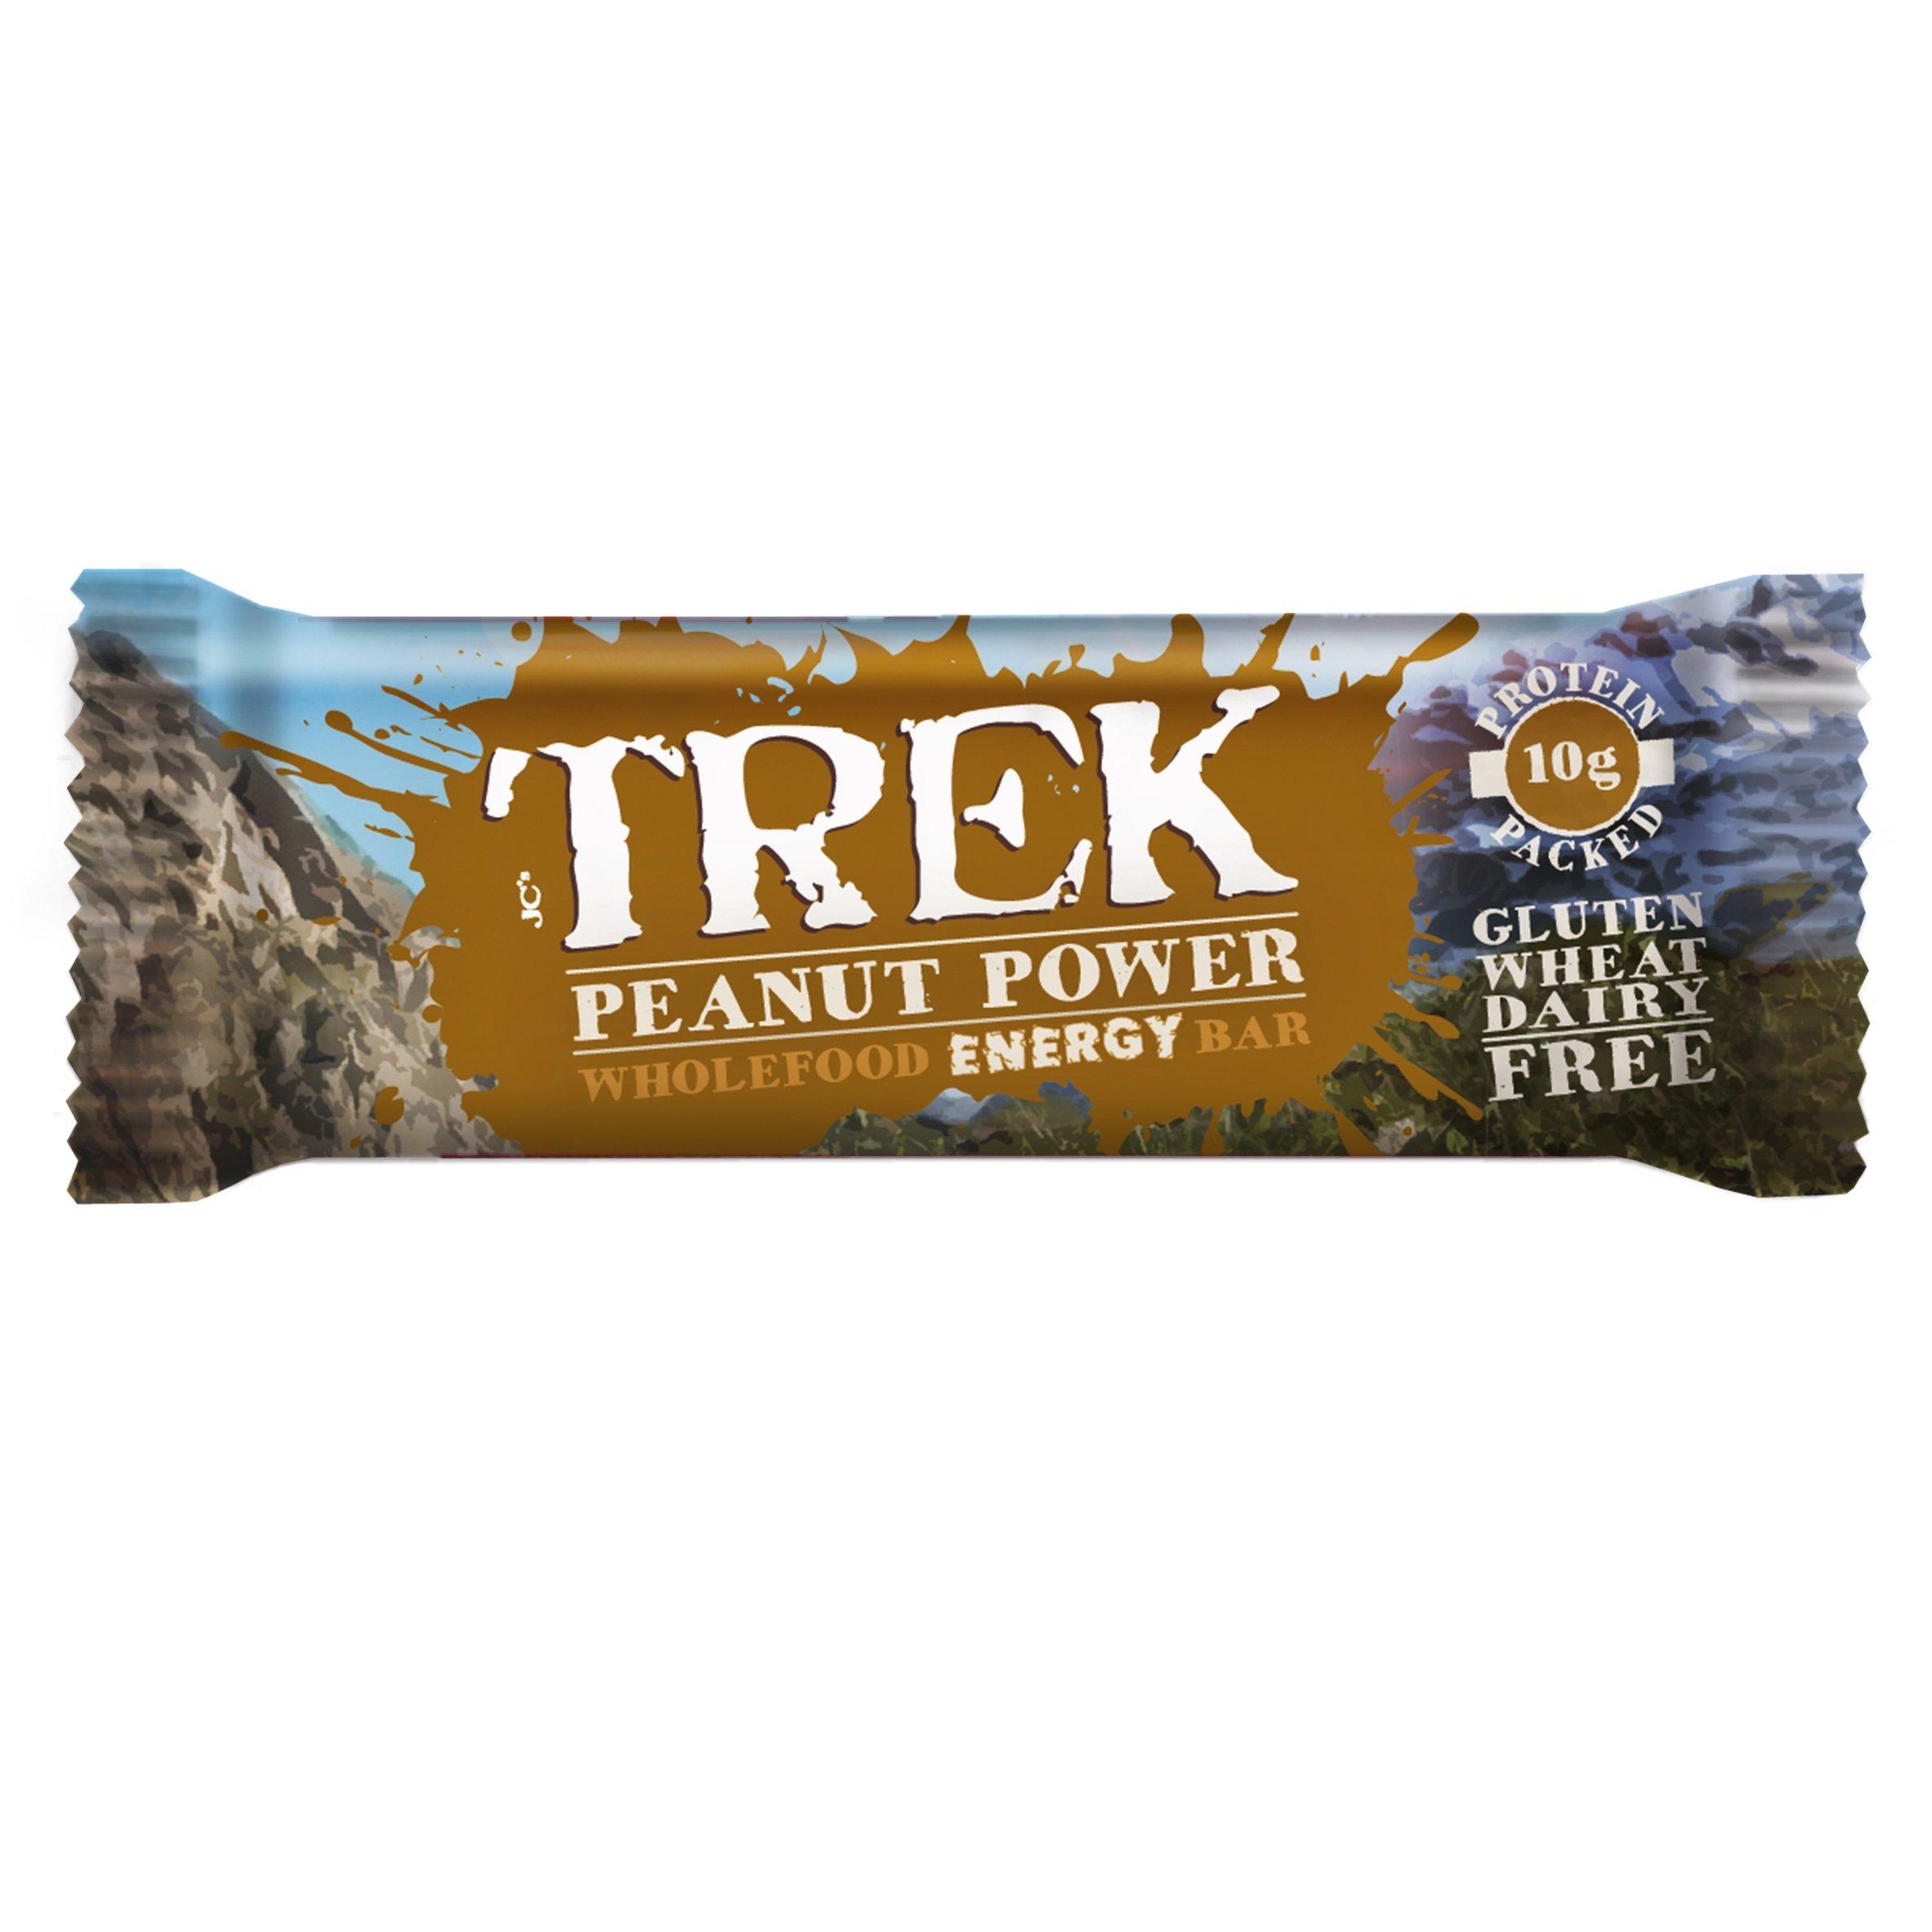 Trek Peanut Power Natural Wholefood Energy Bar - 16 x 55g